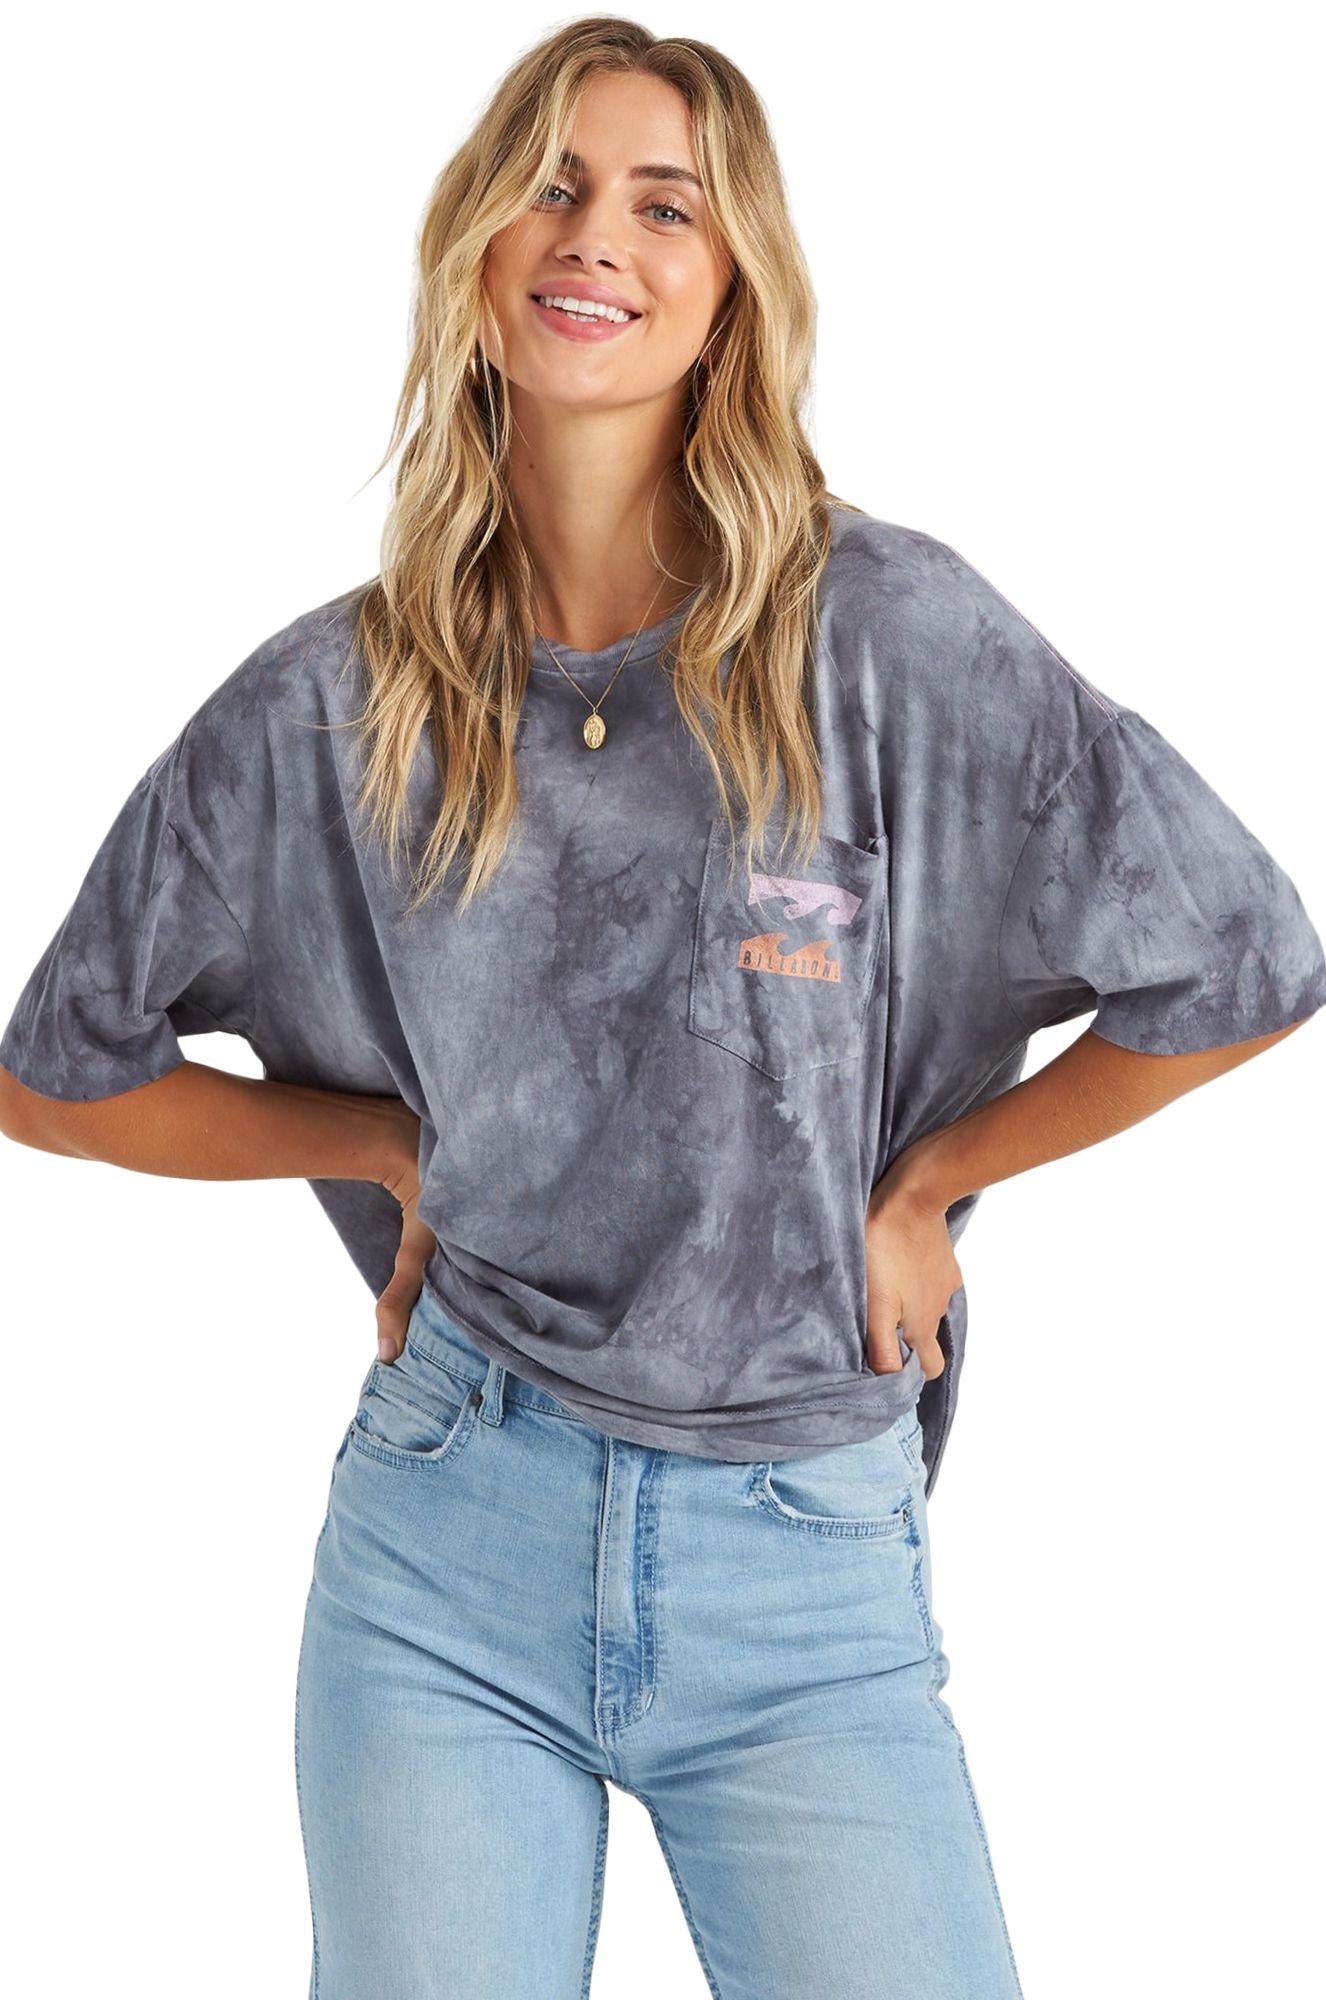 Billabong T-Shirt ROUGH WAVES SWEET SESSIONS Ink